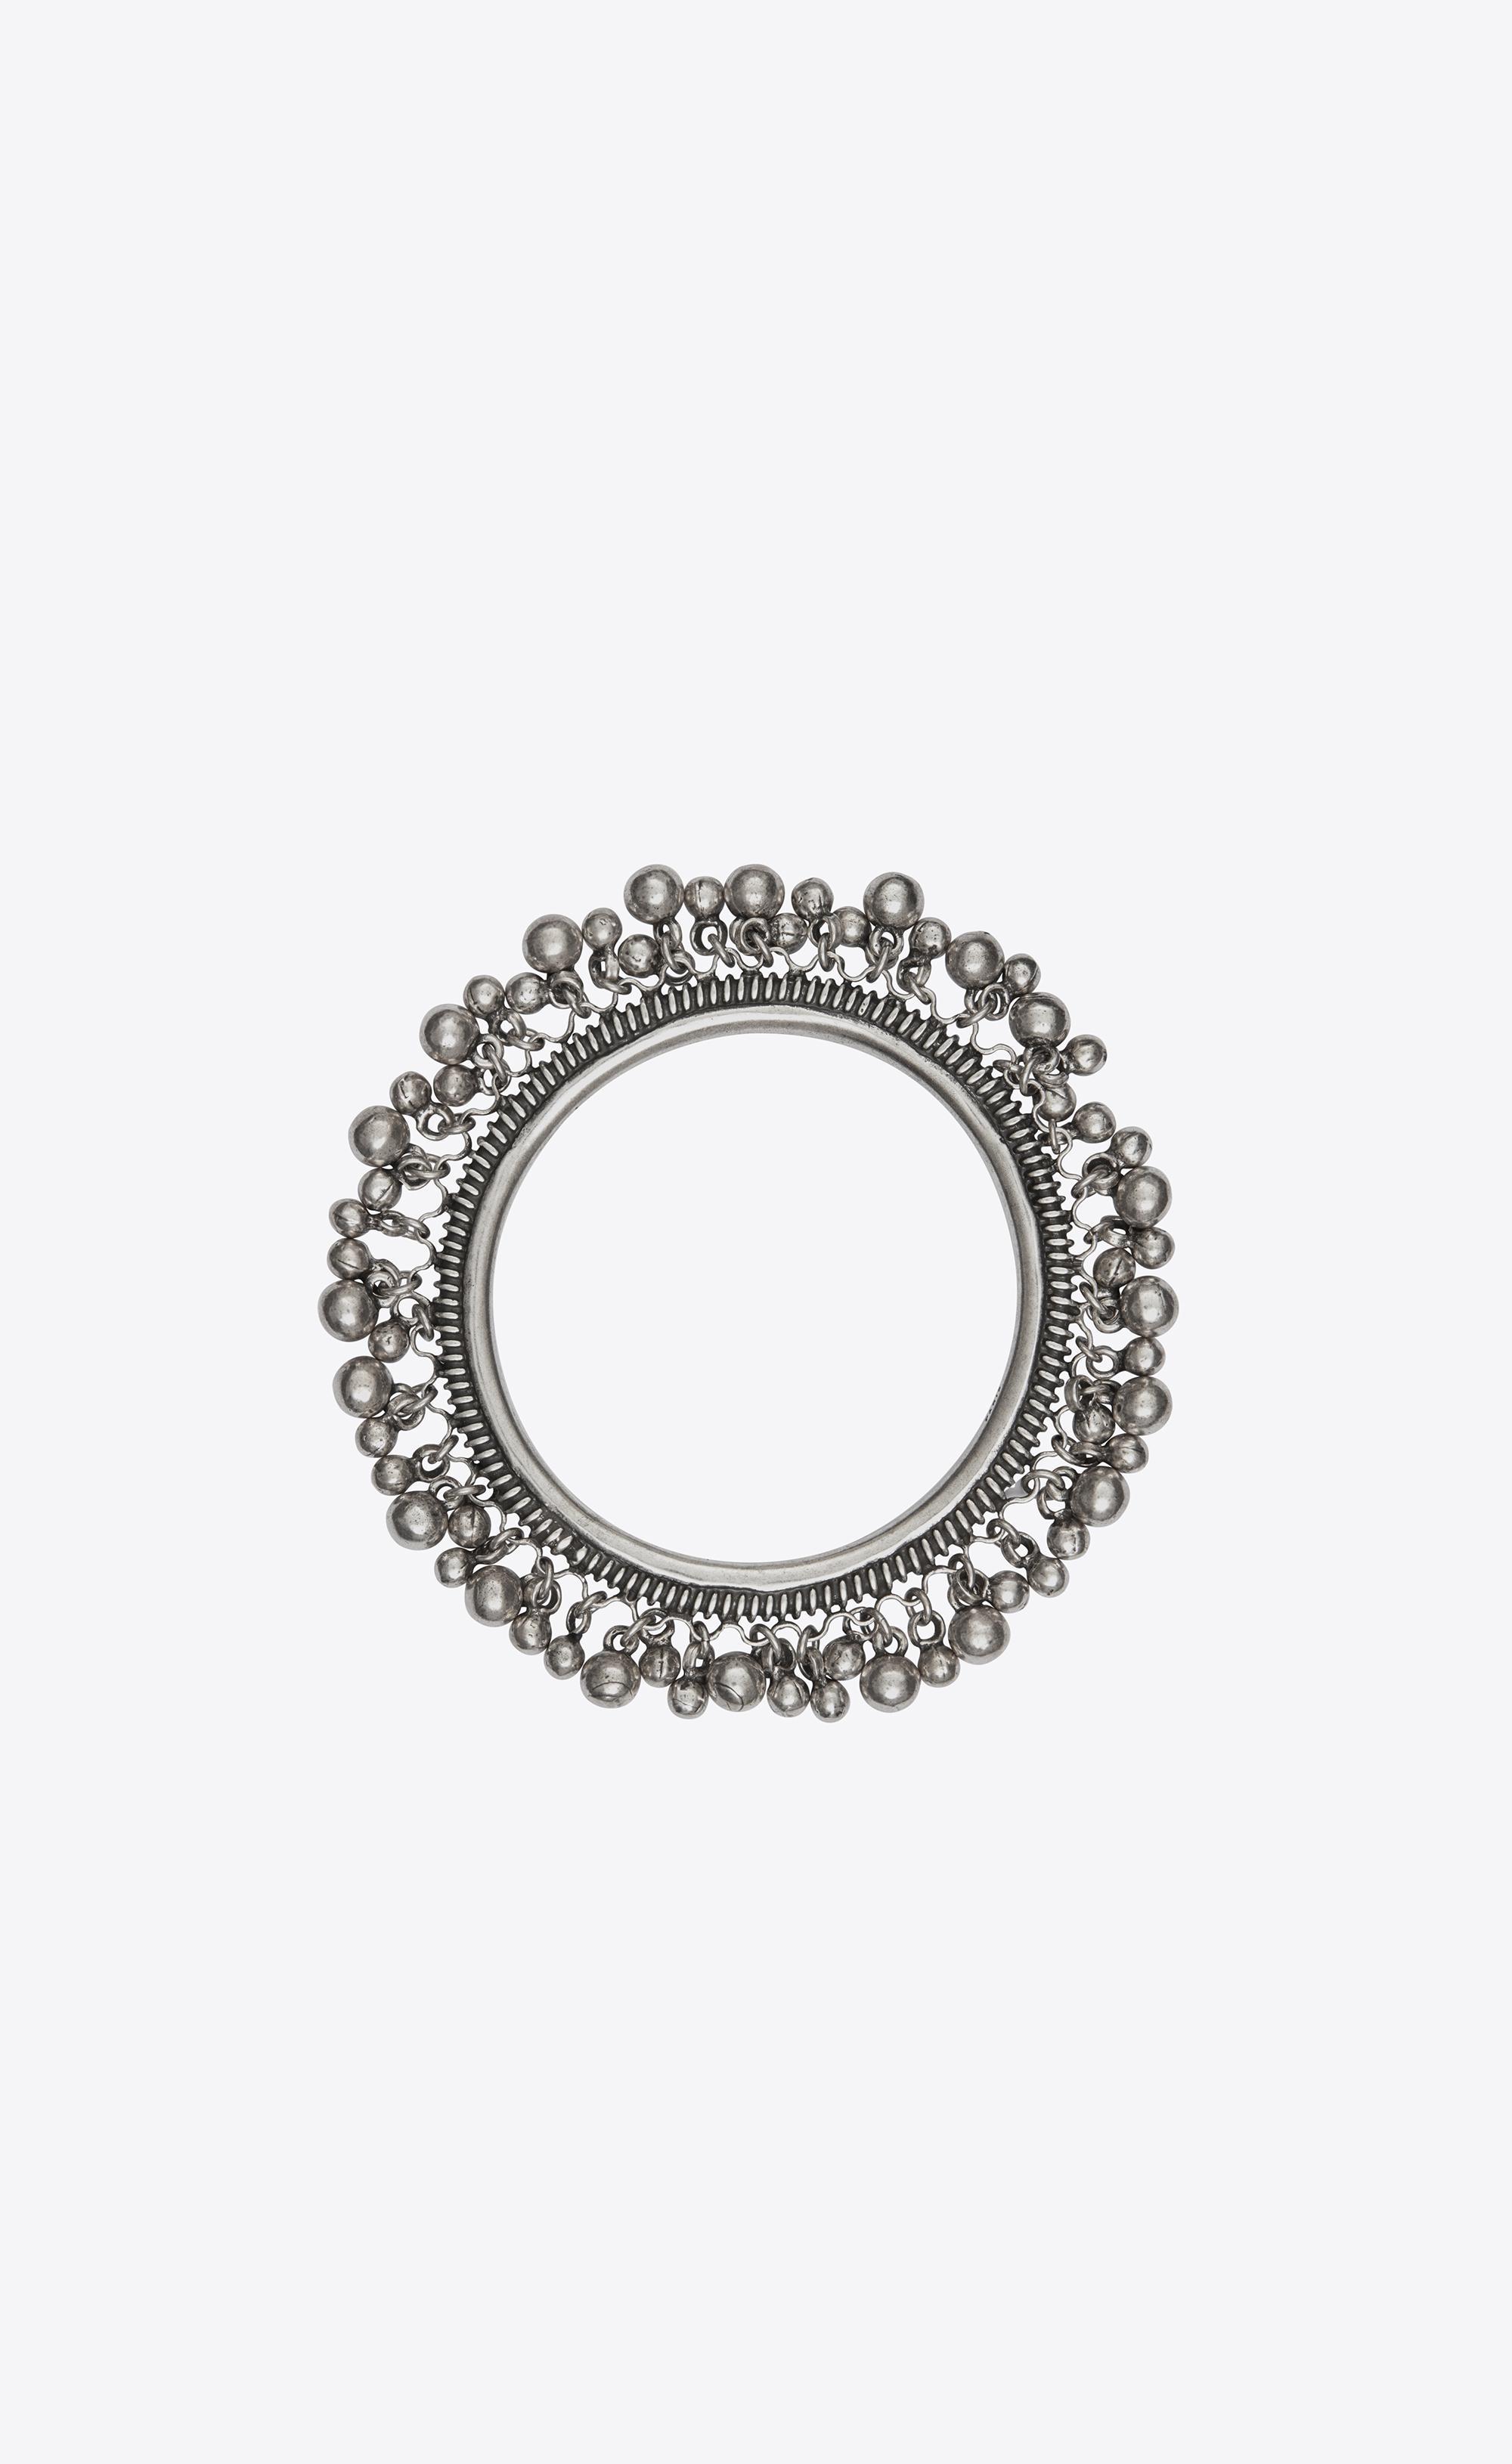 ad308b3b38 Saint Laurent Ysl Folk Bracelet With Bells In Silver Metal. in ...